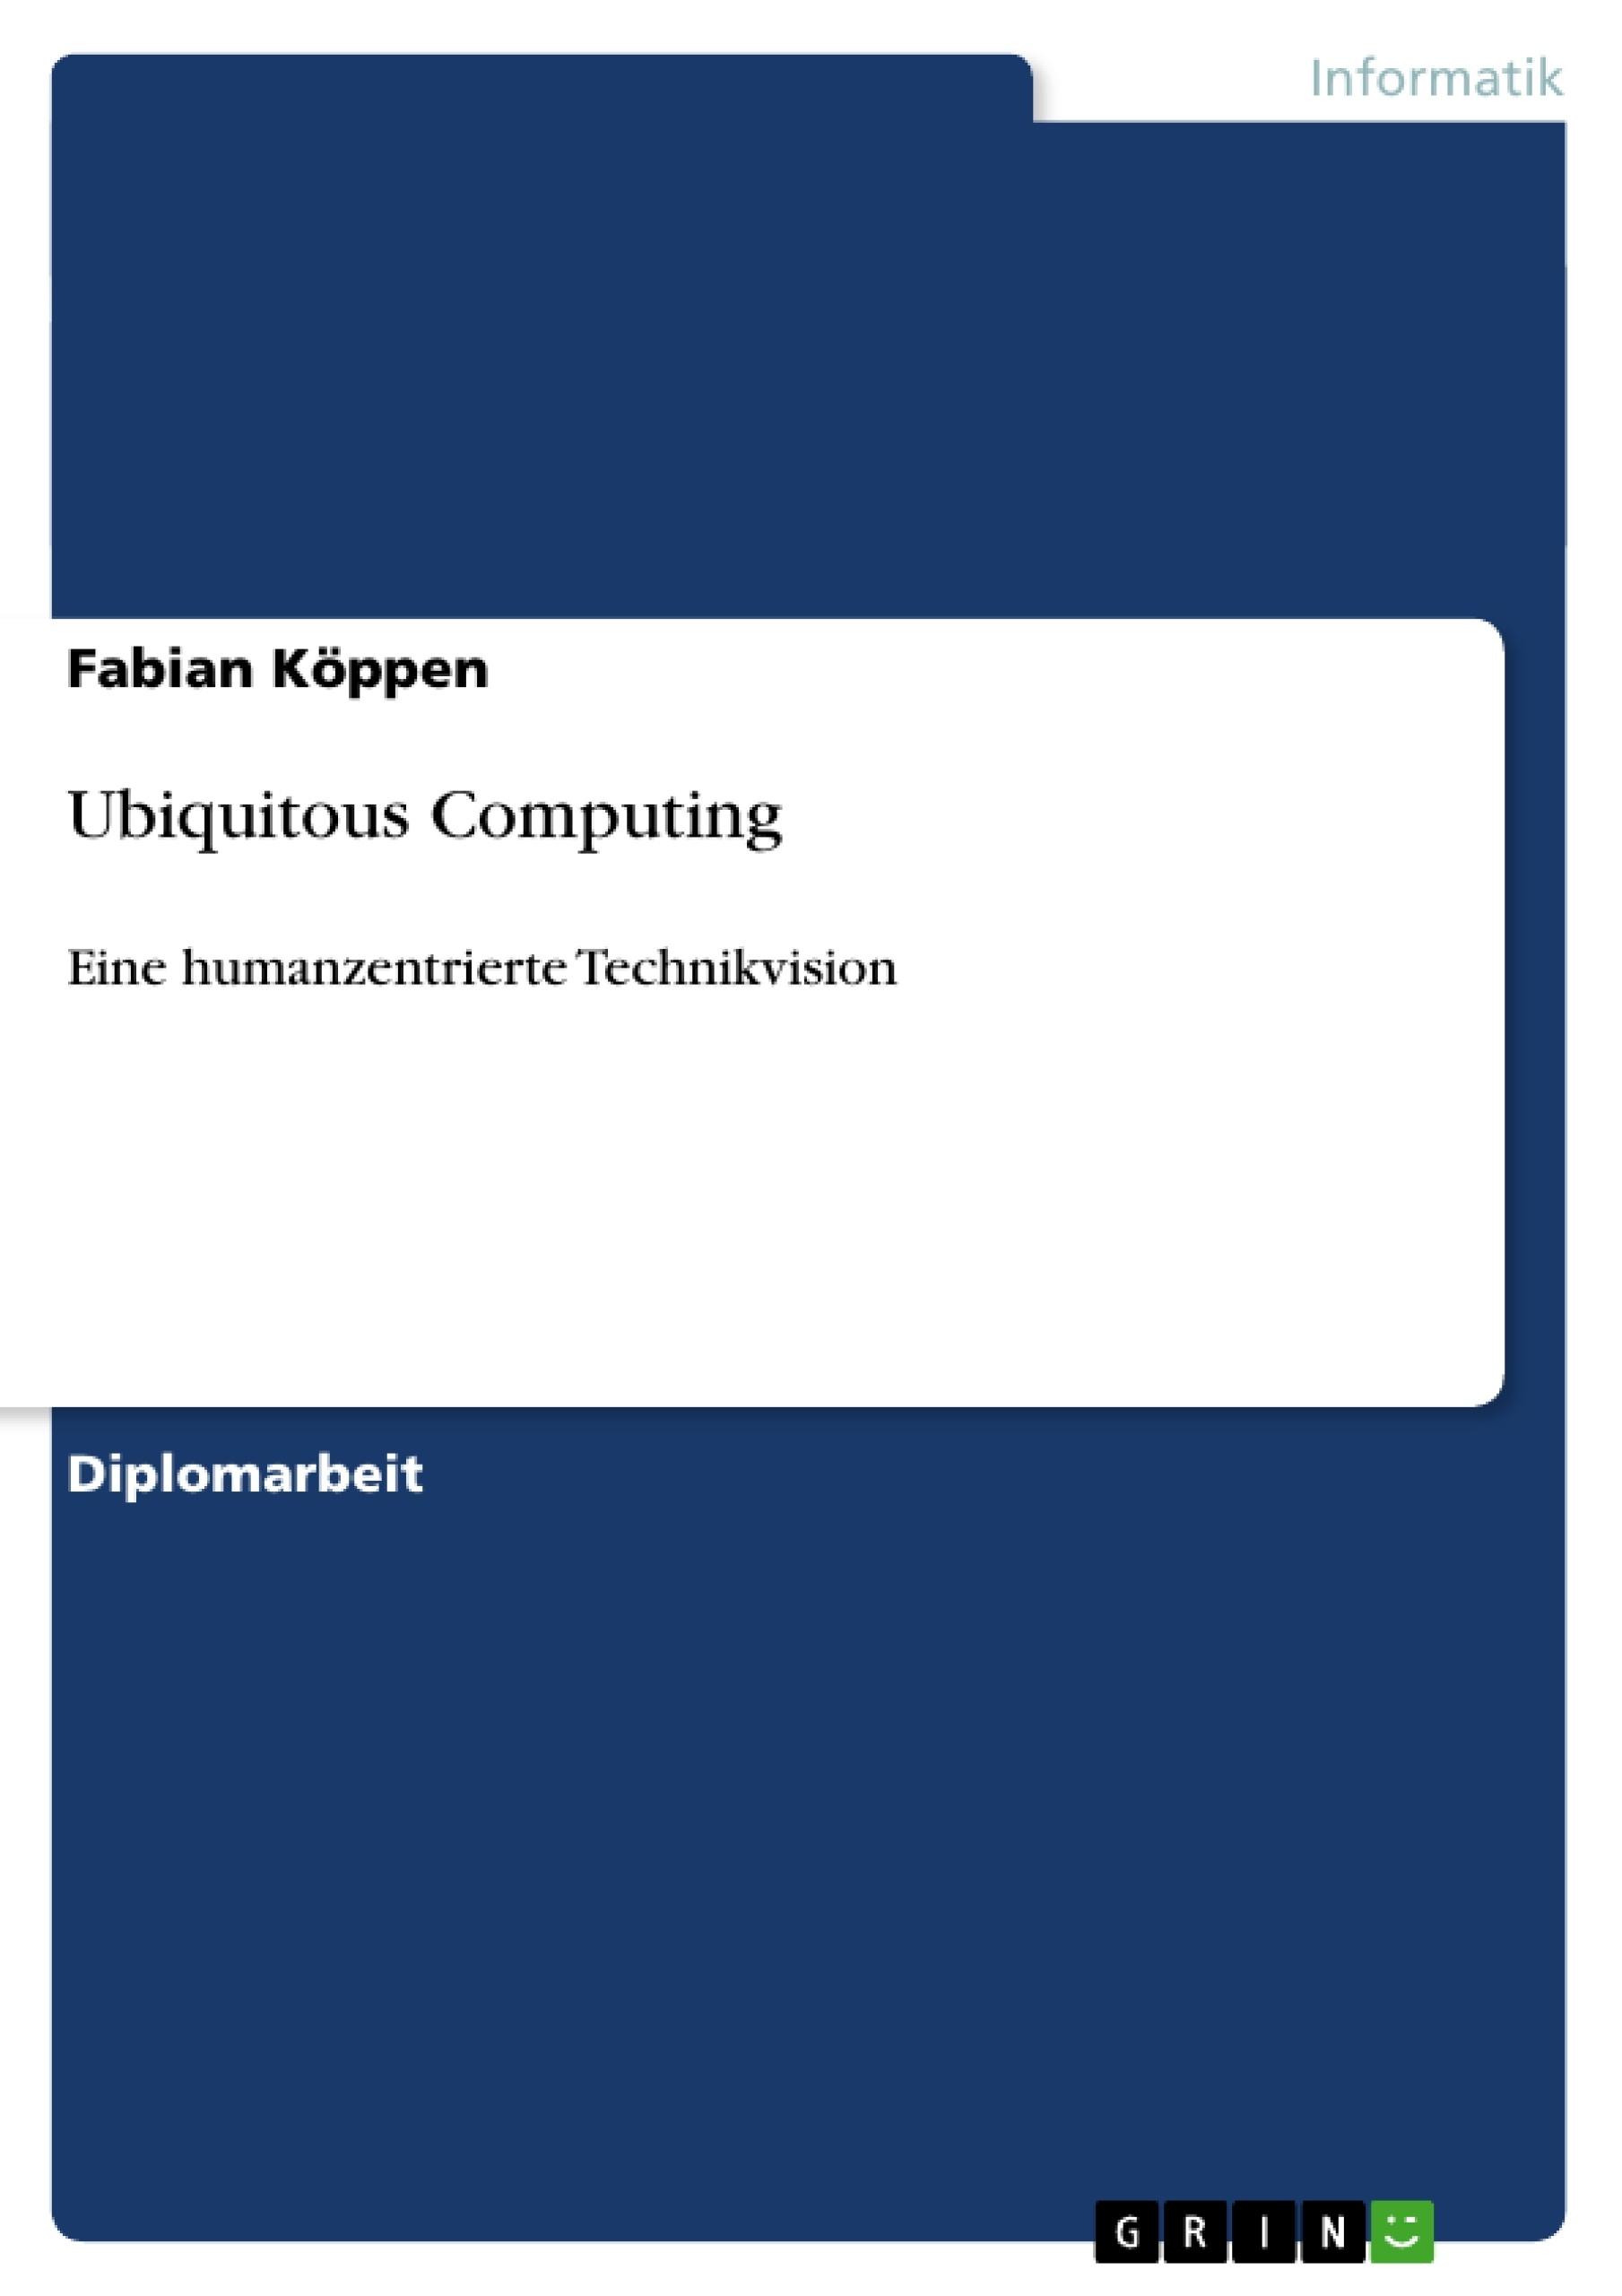 Titel: Ubiquitous Computing